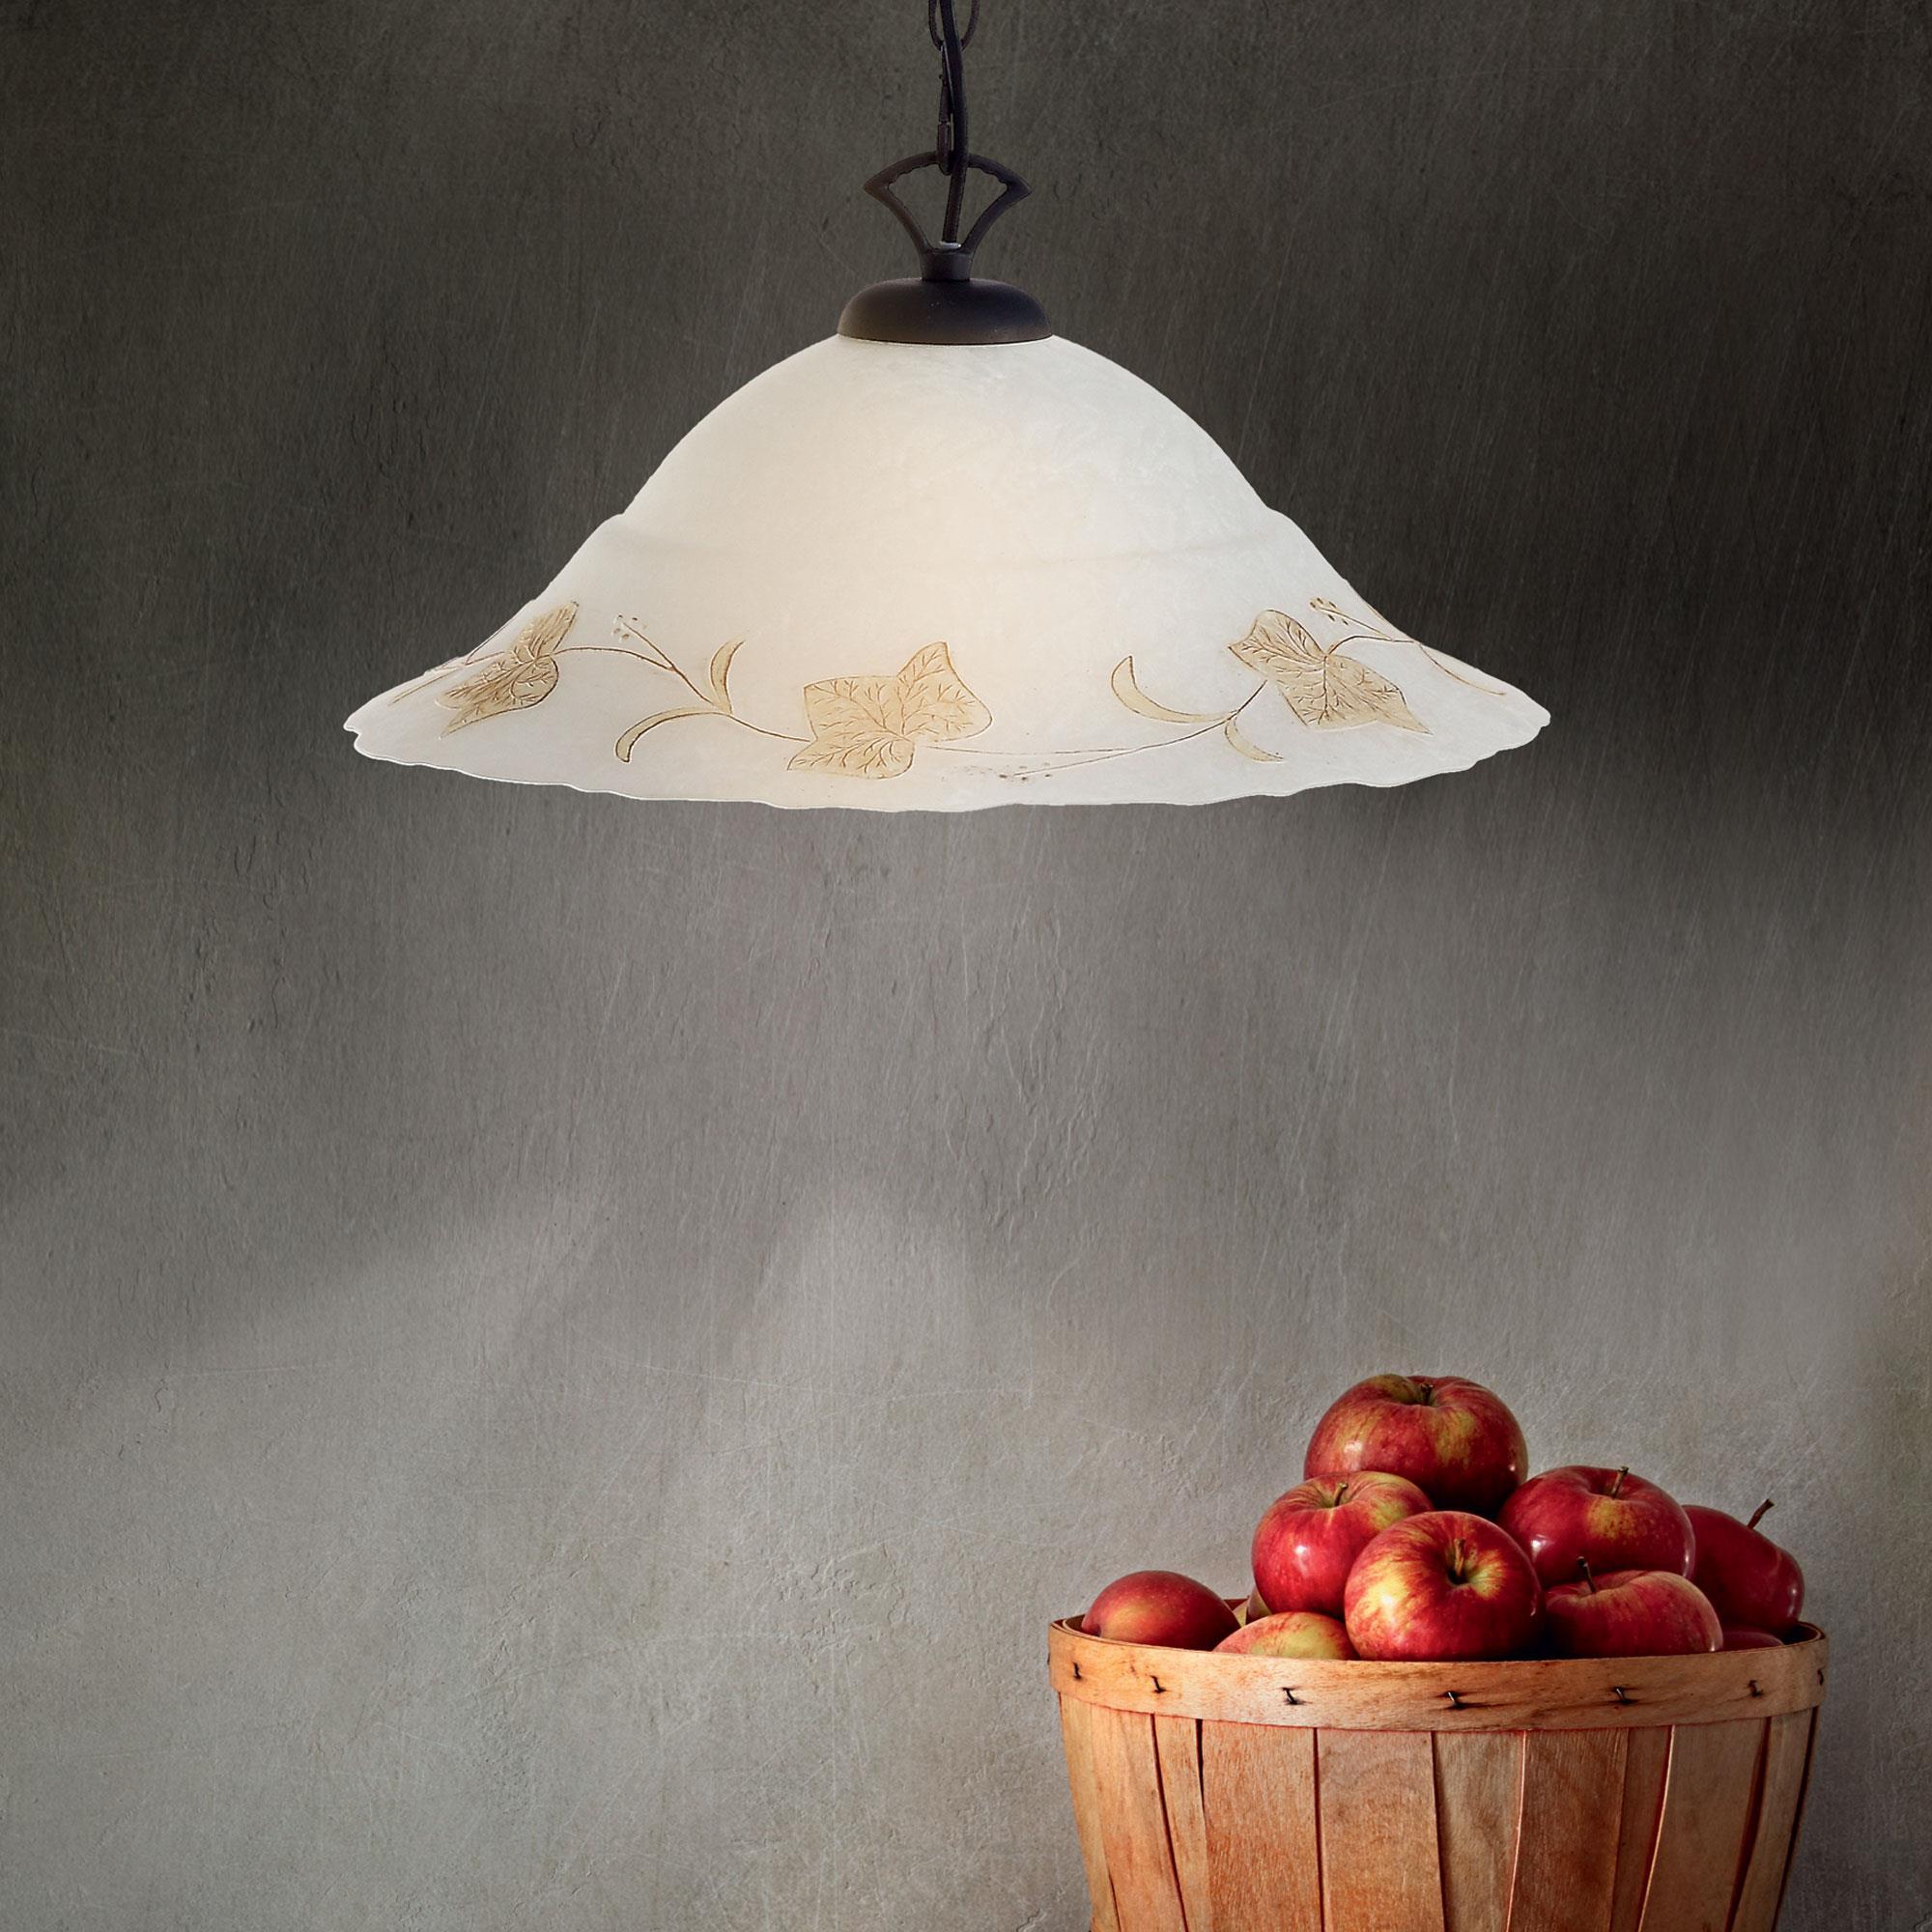 Ideal Lux 007533 Foglia SP1 D40 lámpa függeszték